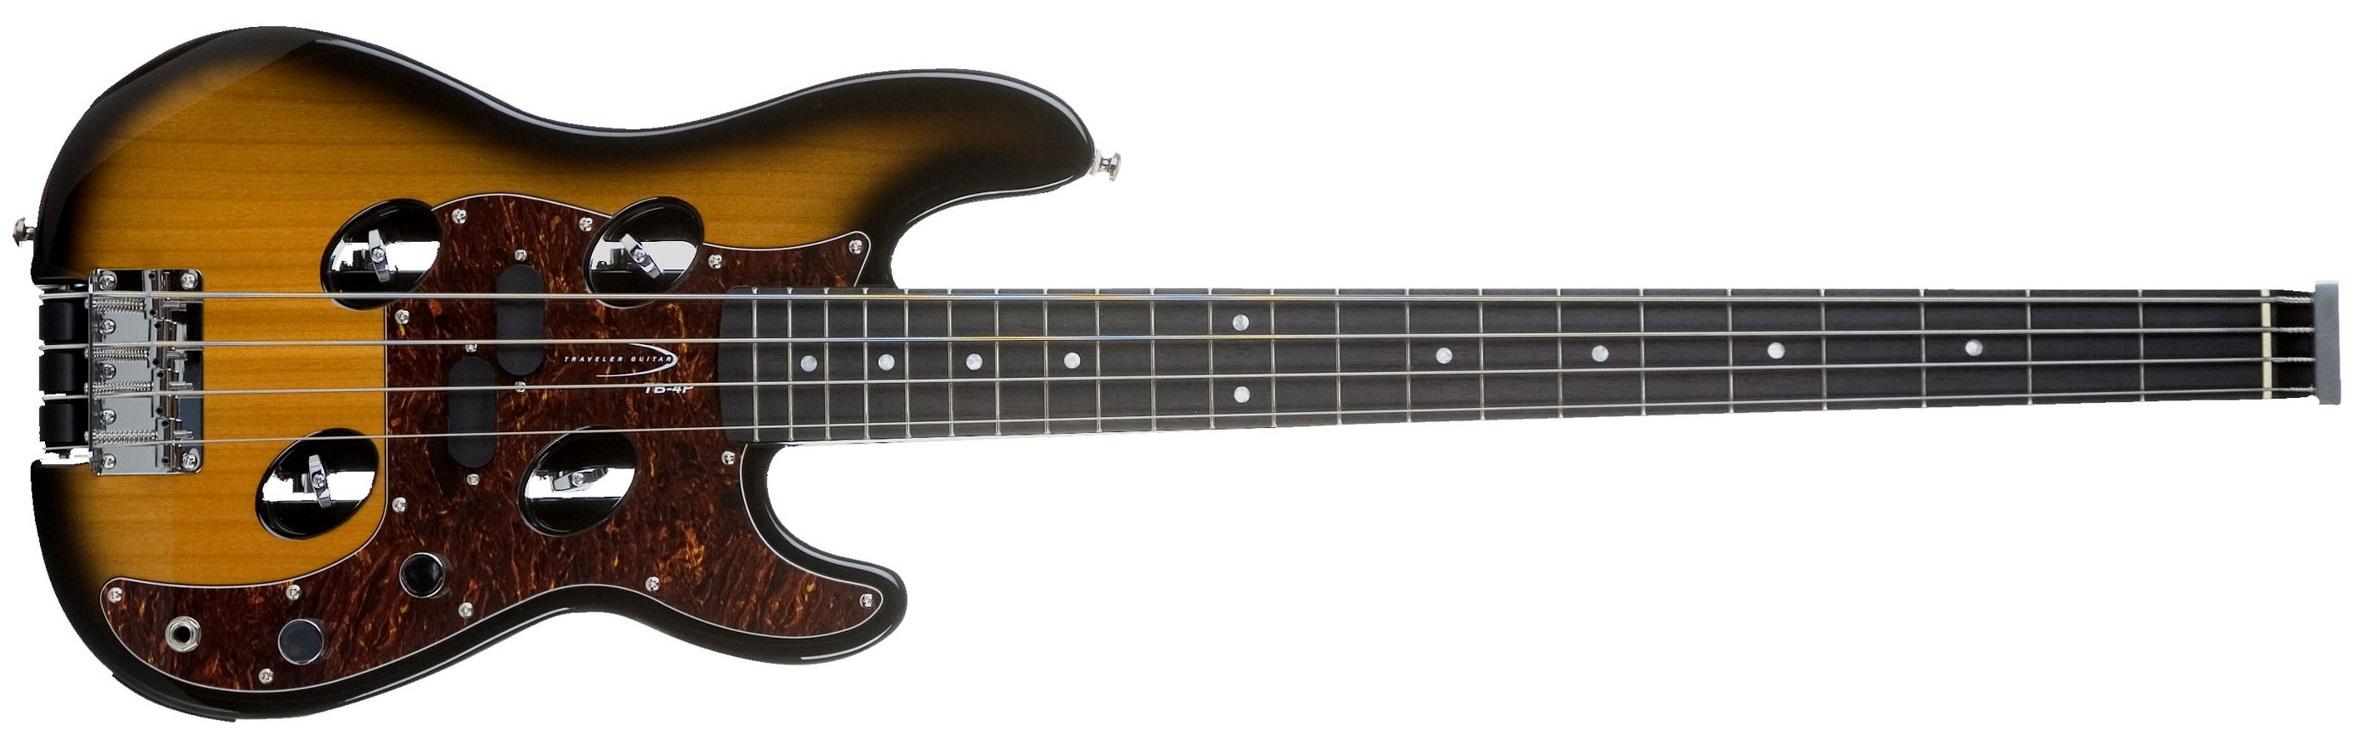 Traveler Guitar Bass 4 String 32 SB